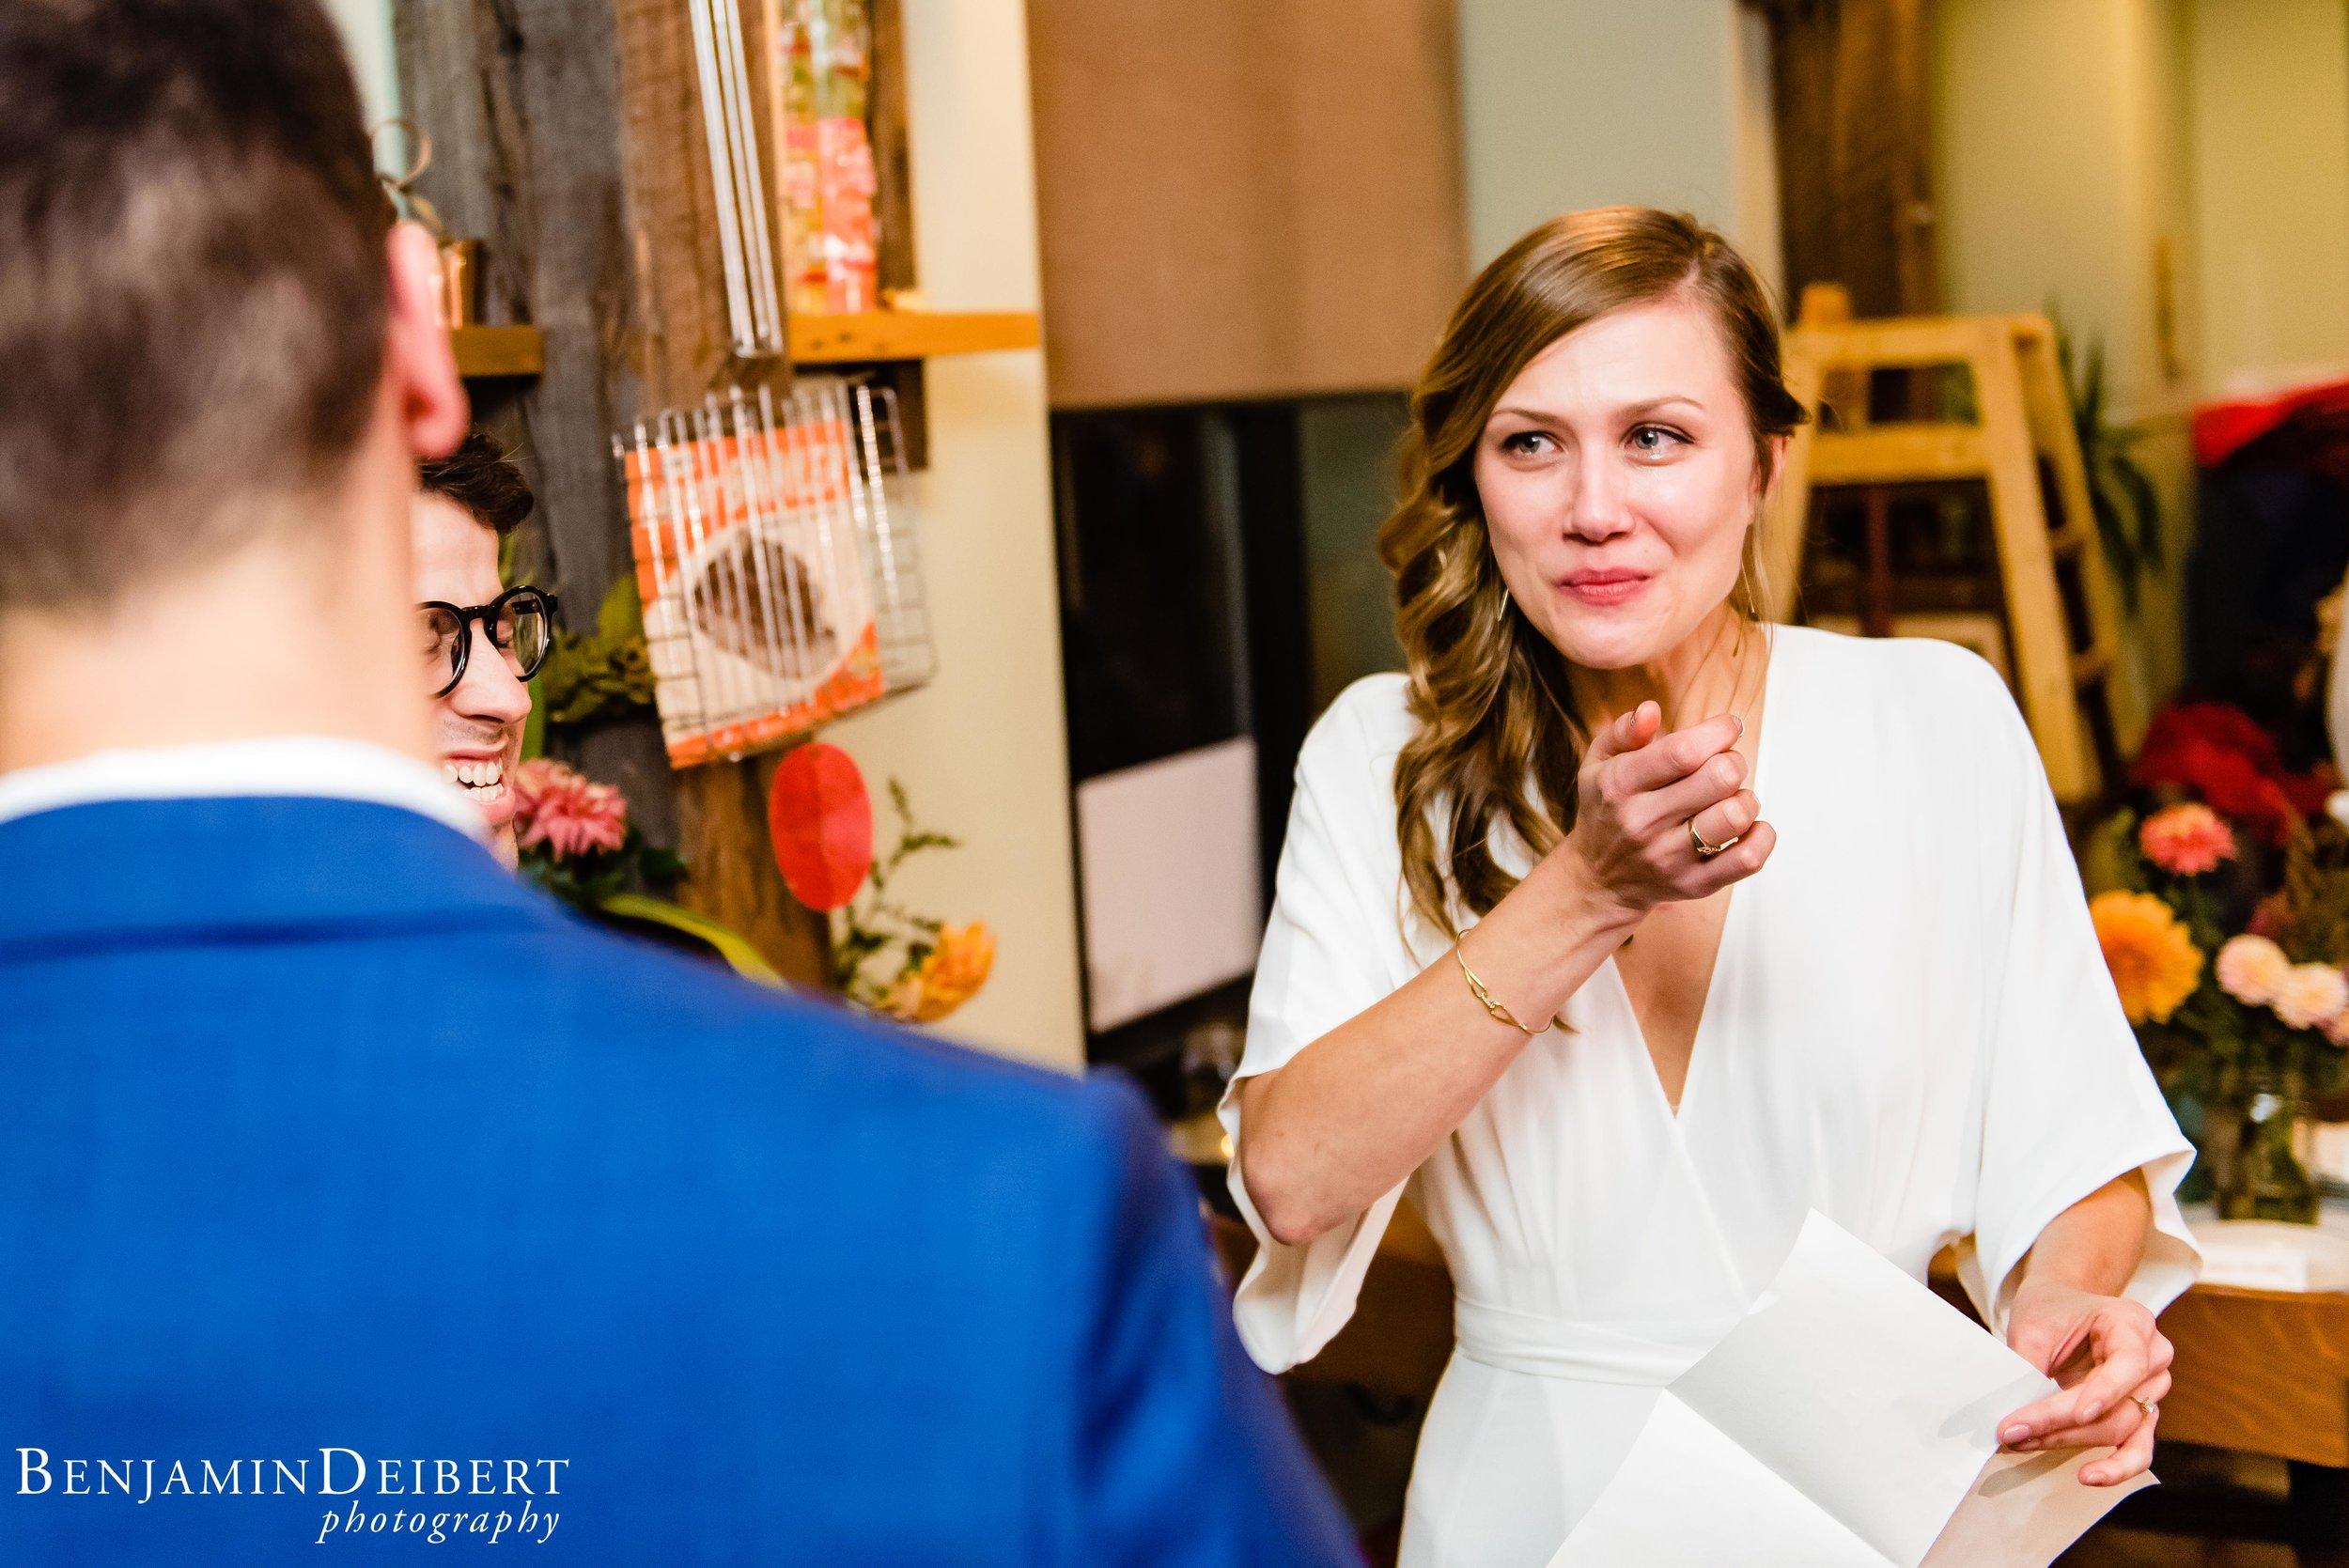 RosieandAvi_HoneysSitNEat_Wedding-37.jpg